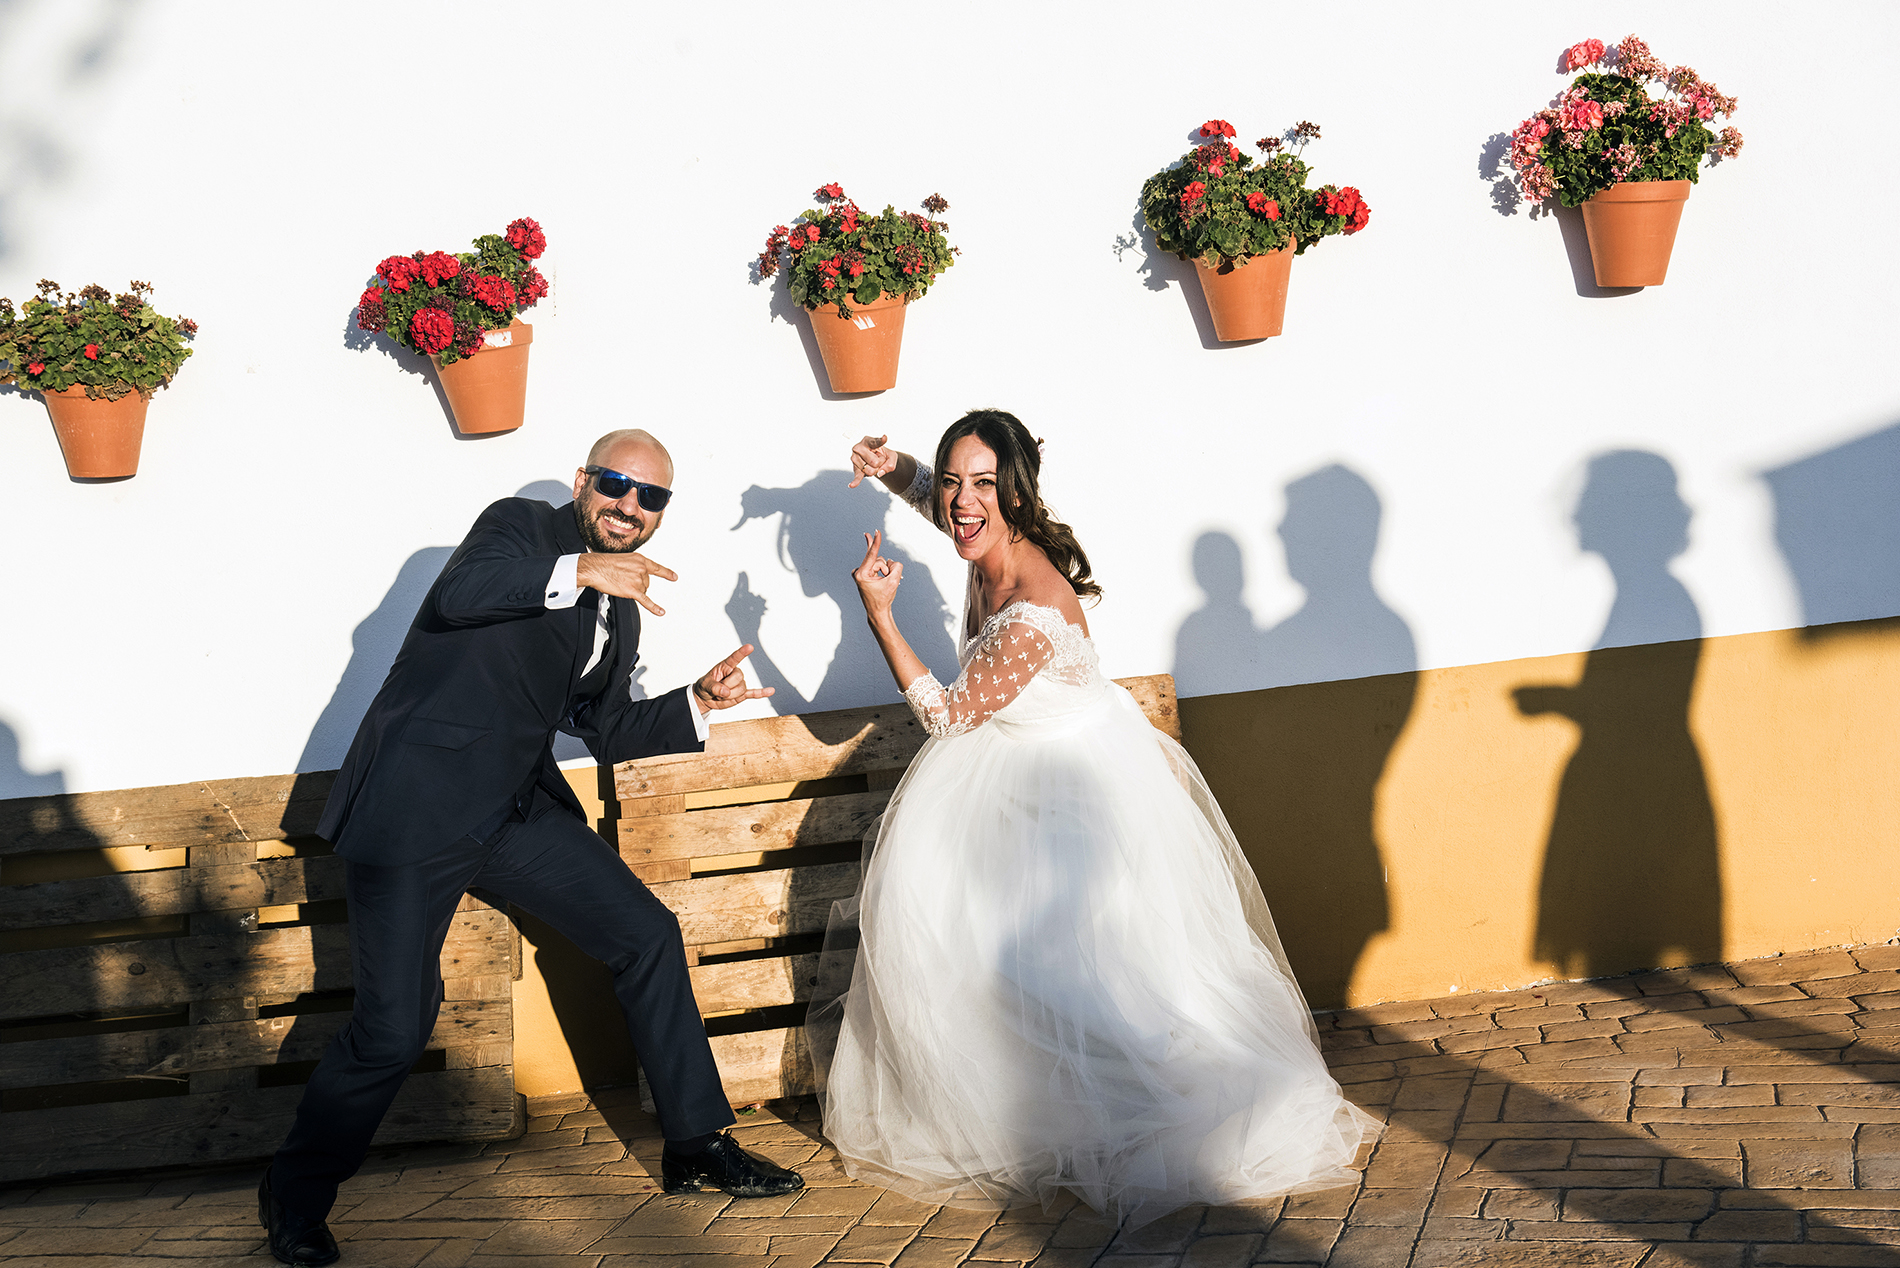 boda granada web 063.JPG